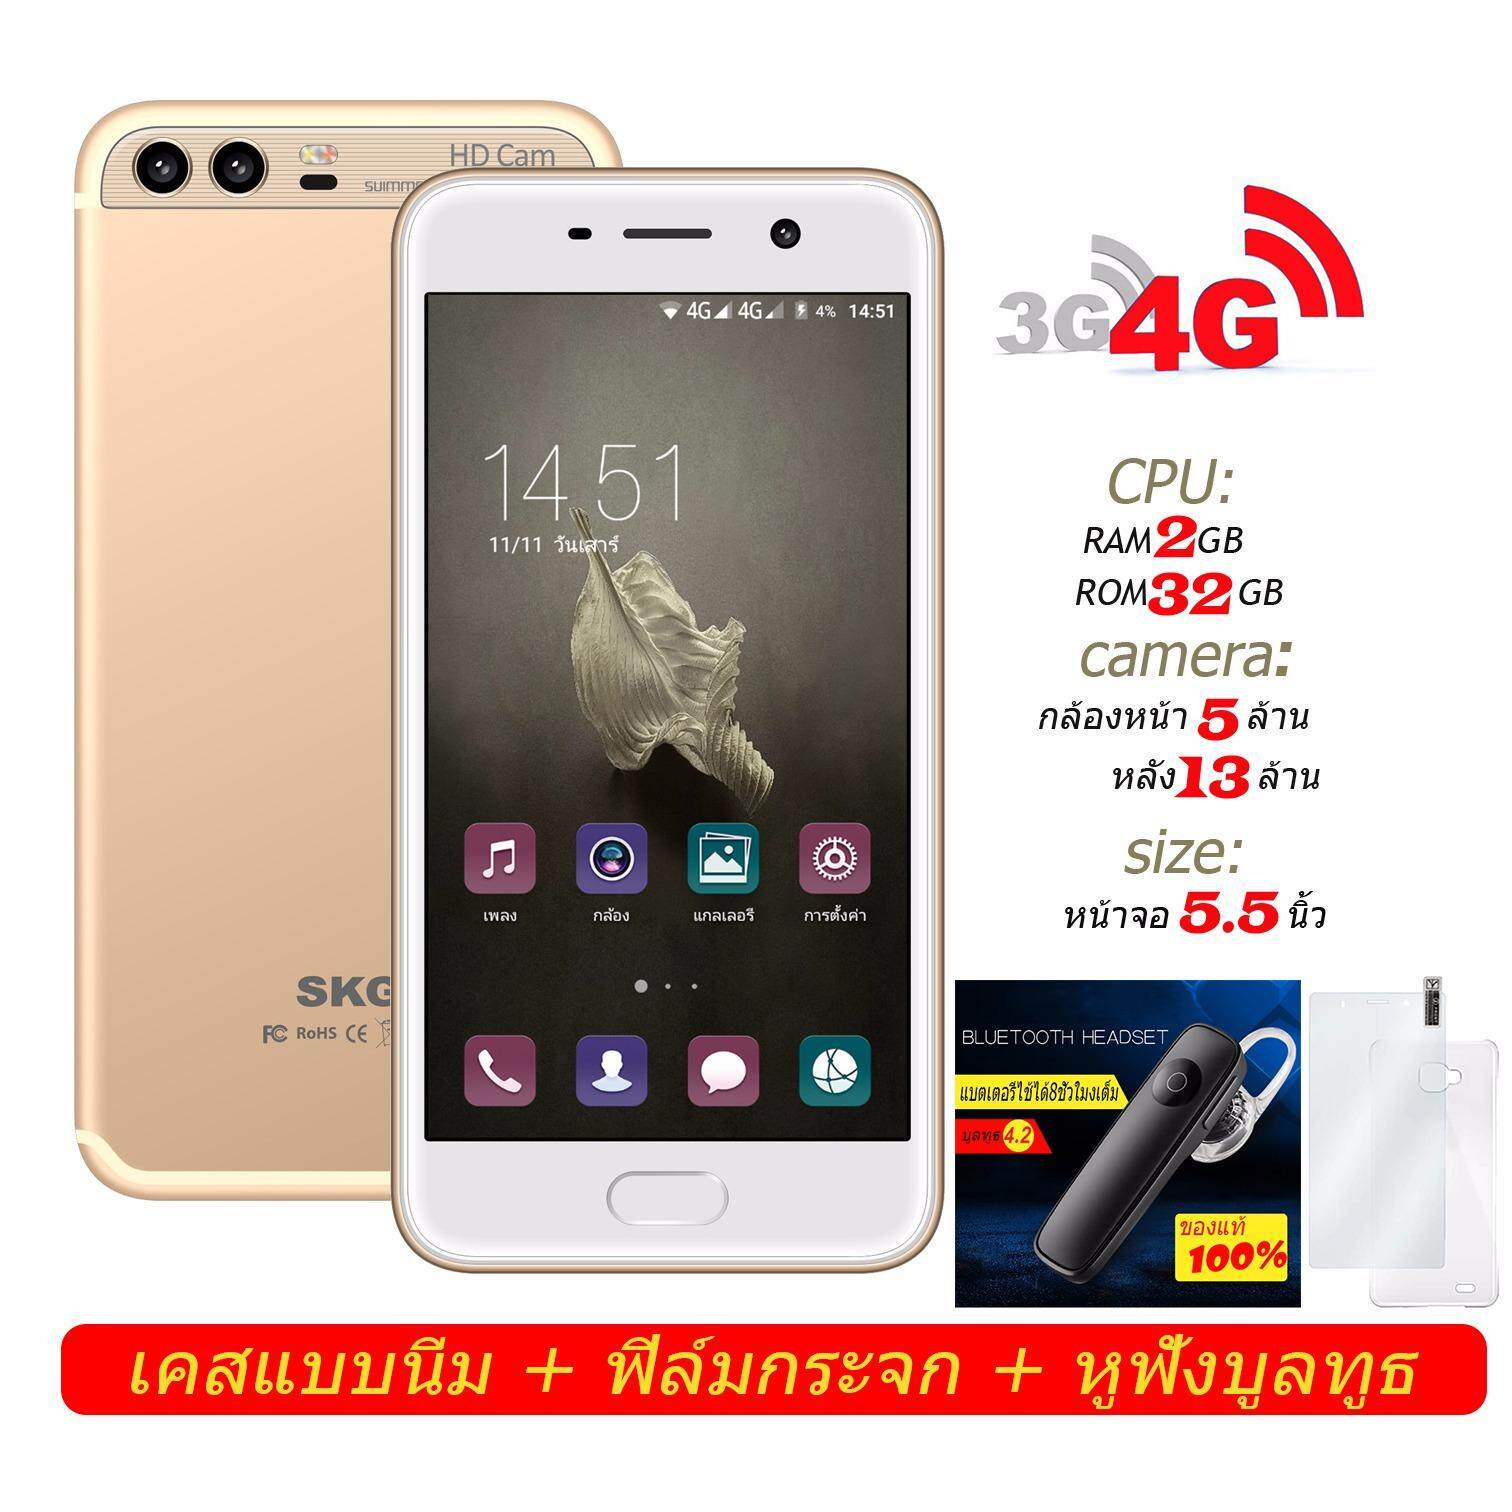 SKG S1 (RAM2GB/32GB) ฟรี!! เคสใส + ฟิล์มกันรอย หูฟังบูลทูธ (รับประศูนย์ไทย 1 ปี)